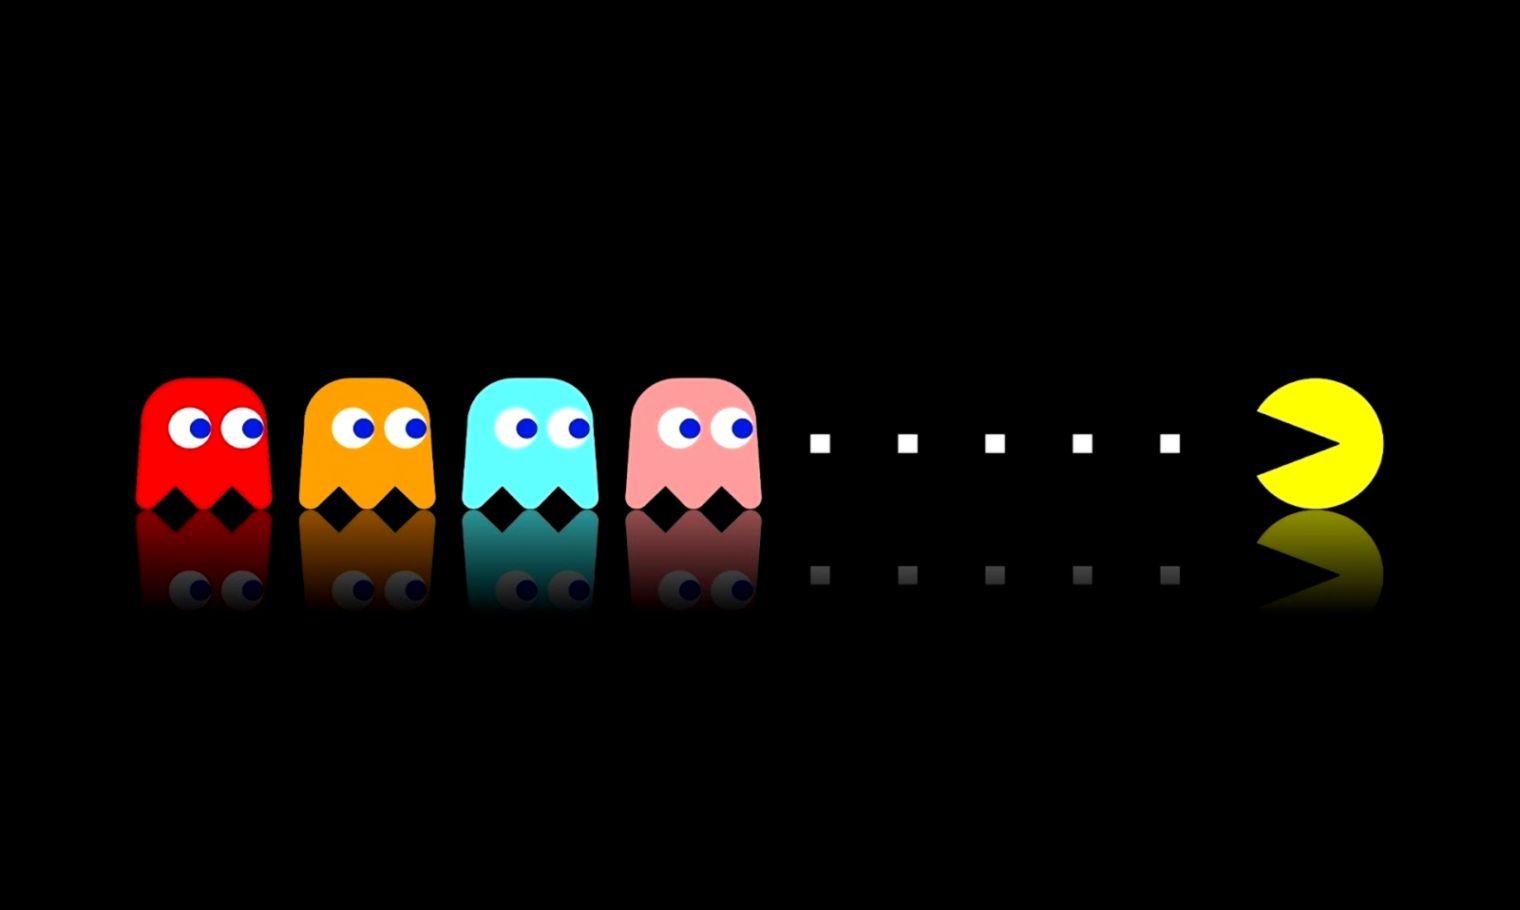 Pacman Iphone 6 Wallpaper Hd: Pacman Iphone 4 Wallpaper